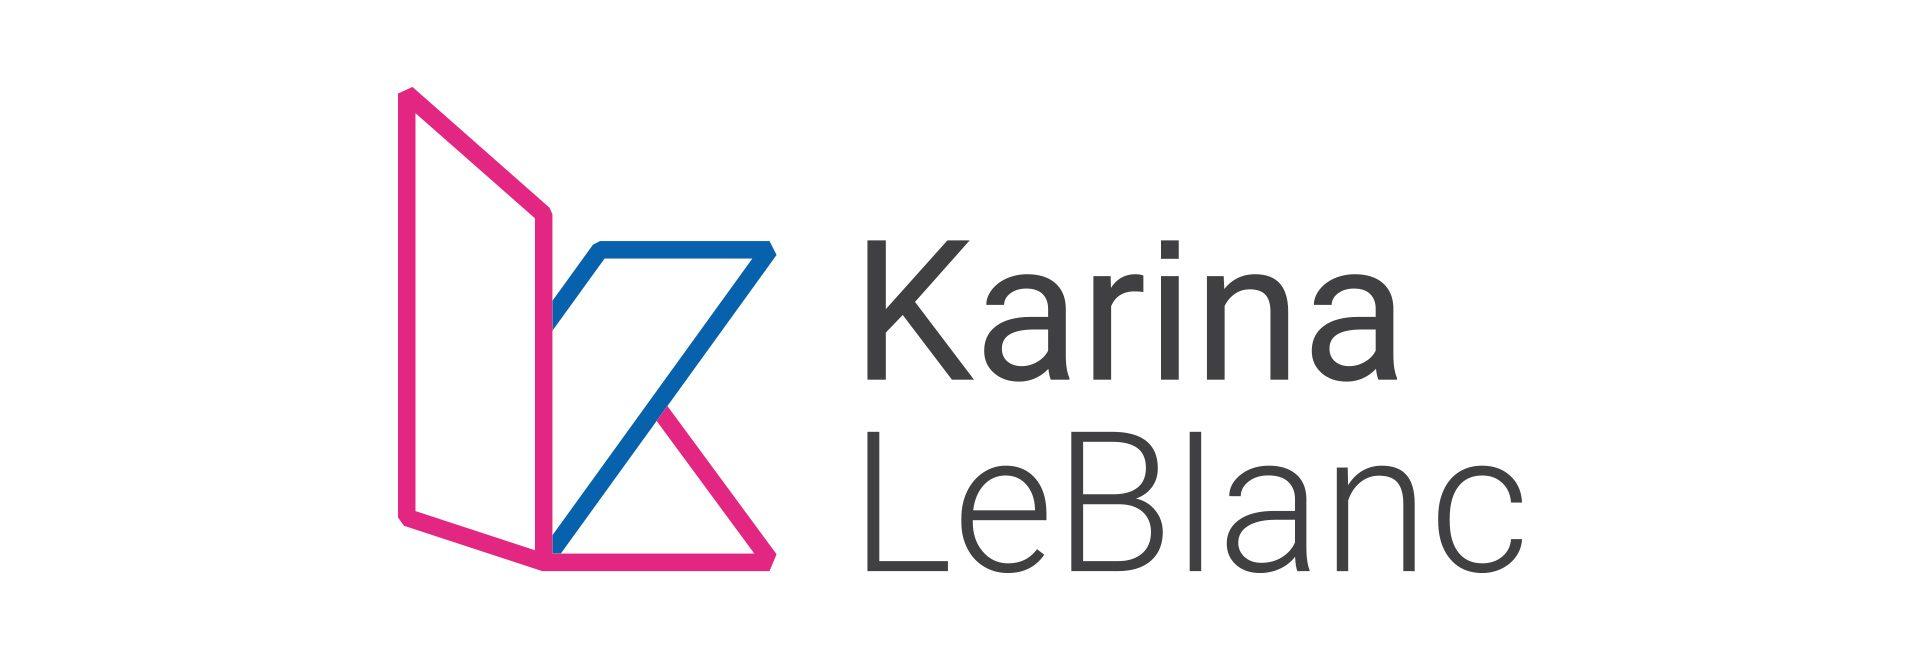 Y5 Creative Case Studies Branding Karina LeBlanc